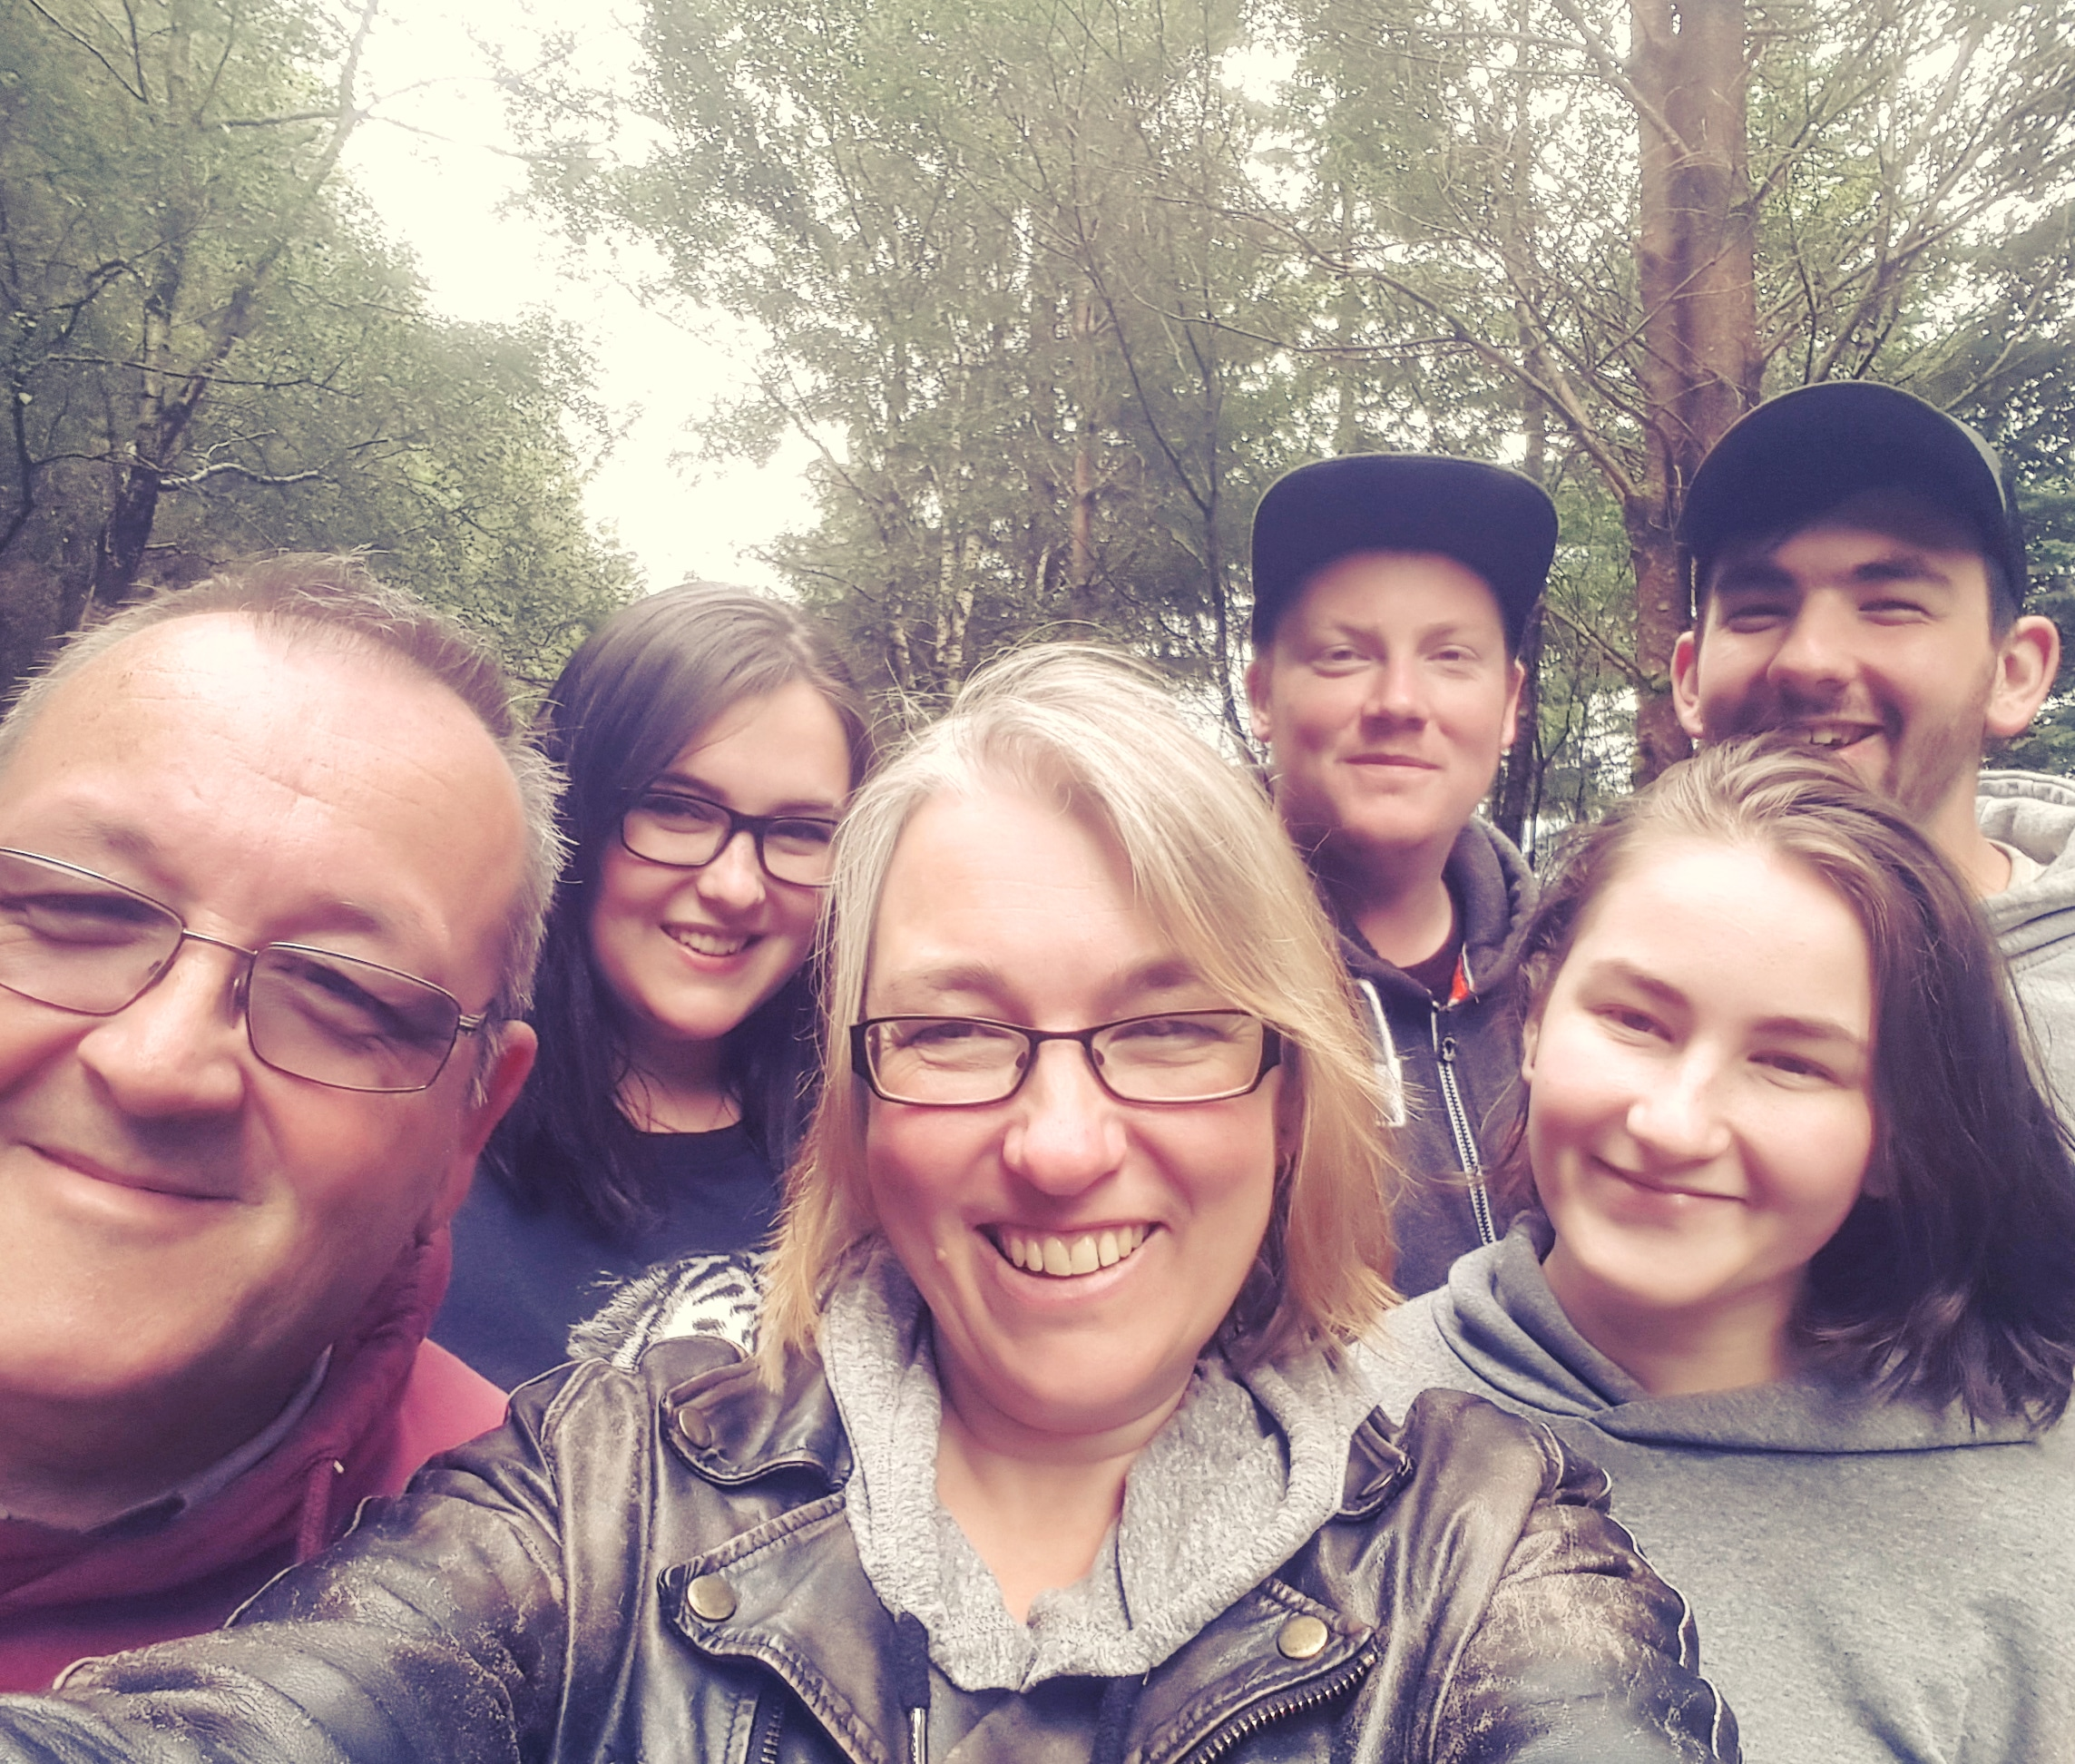 Family Selfie - The Last Krystallos